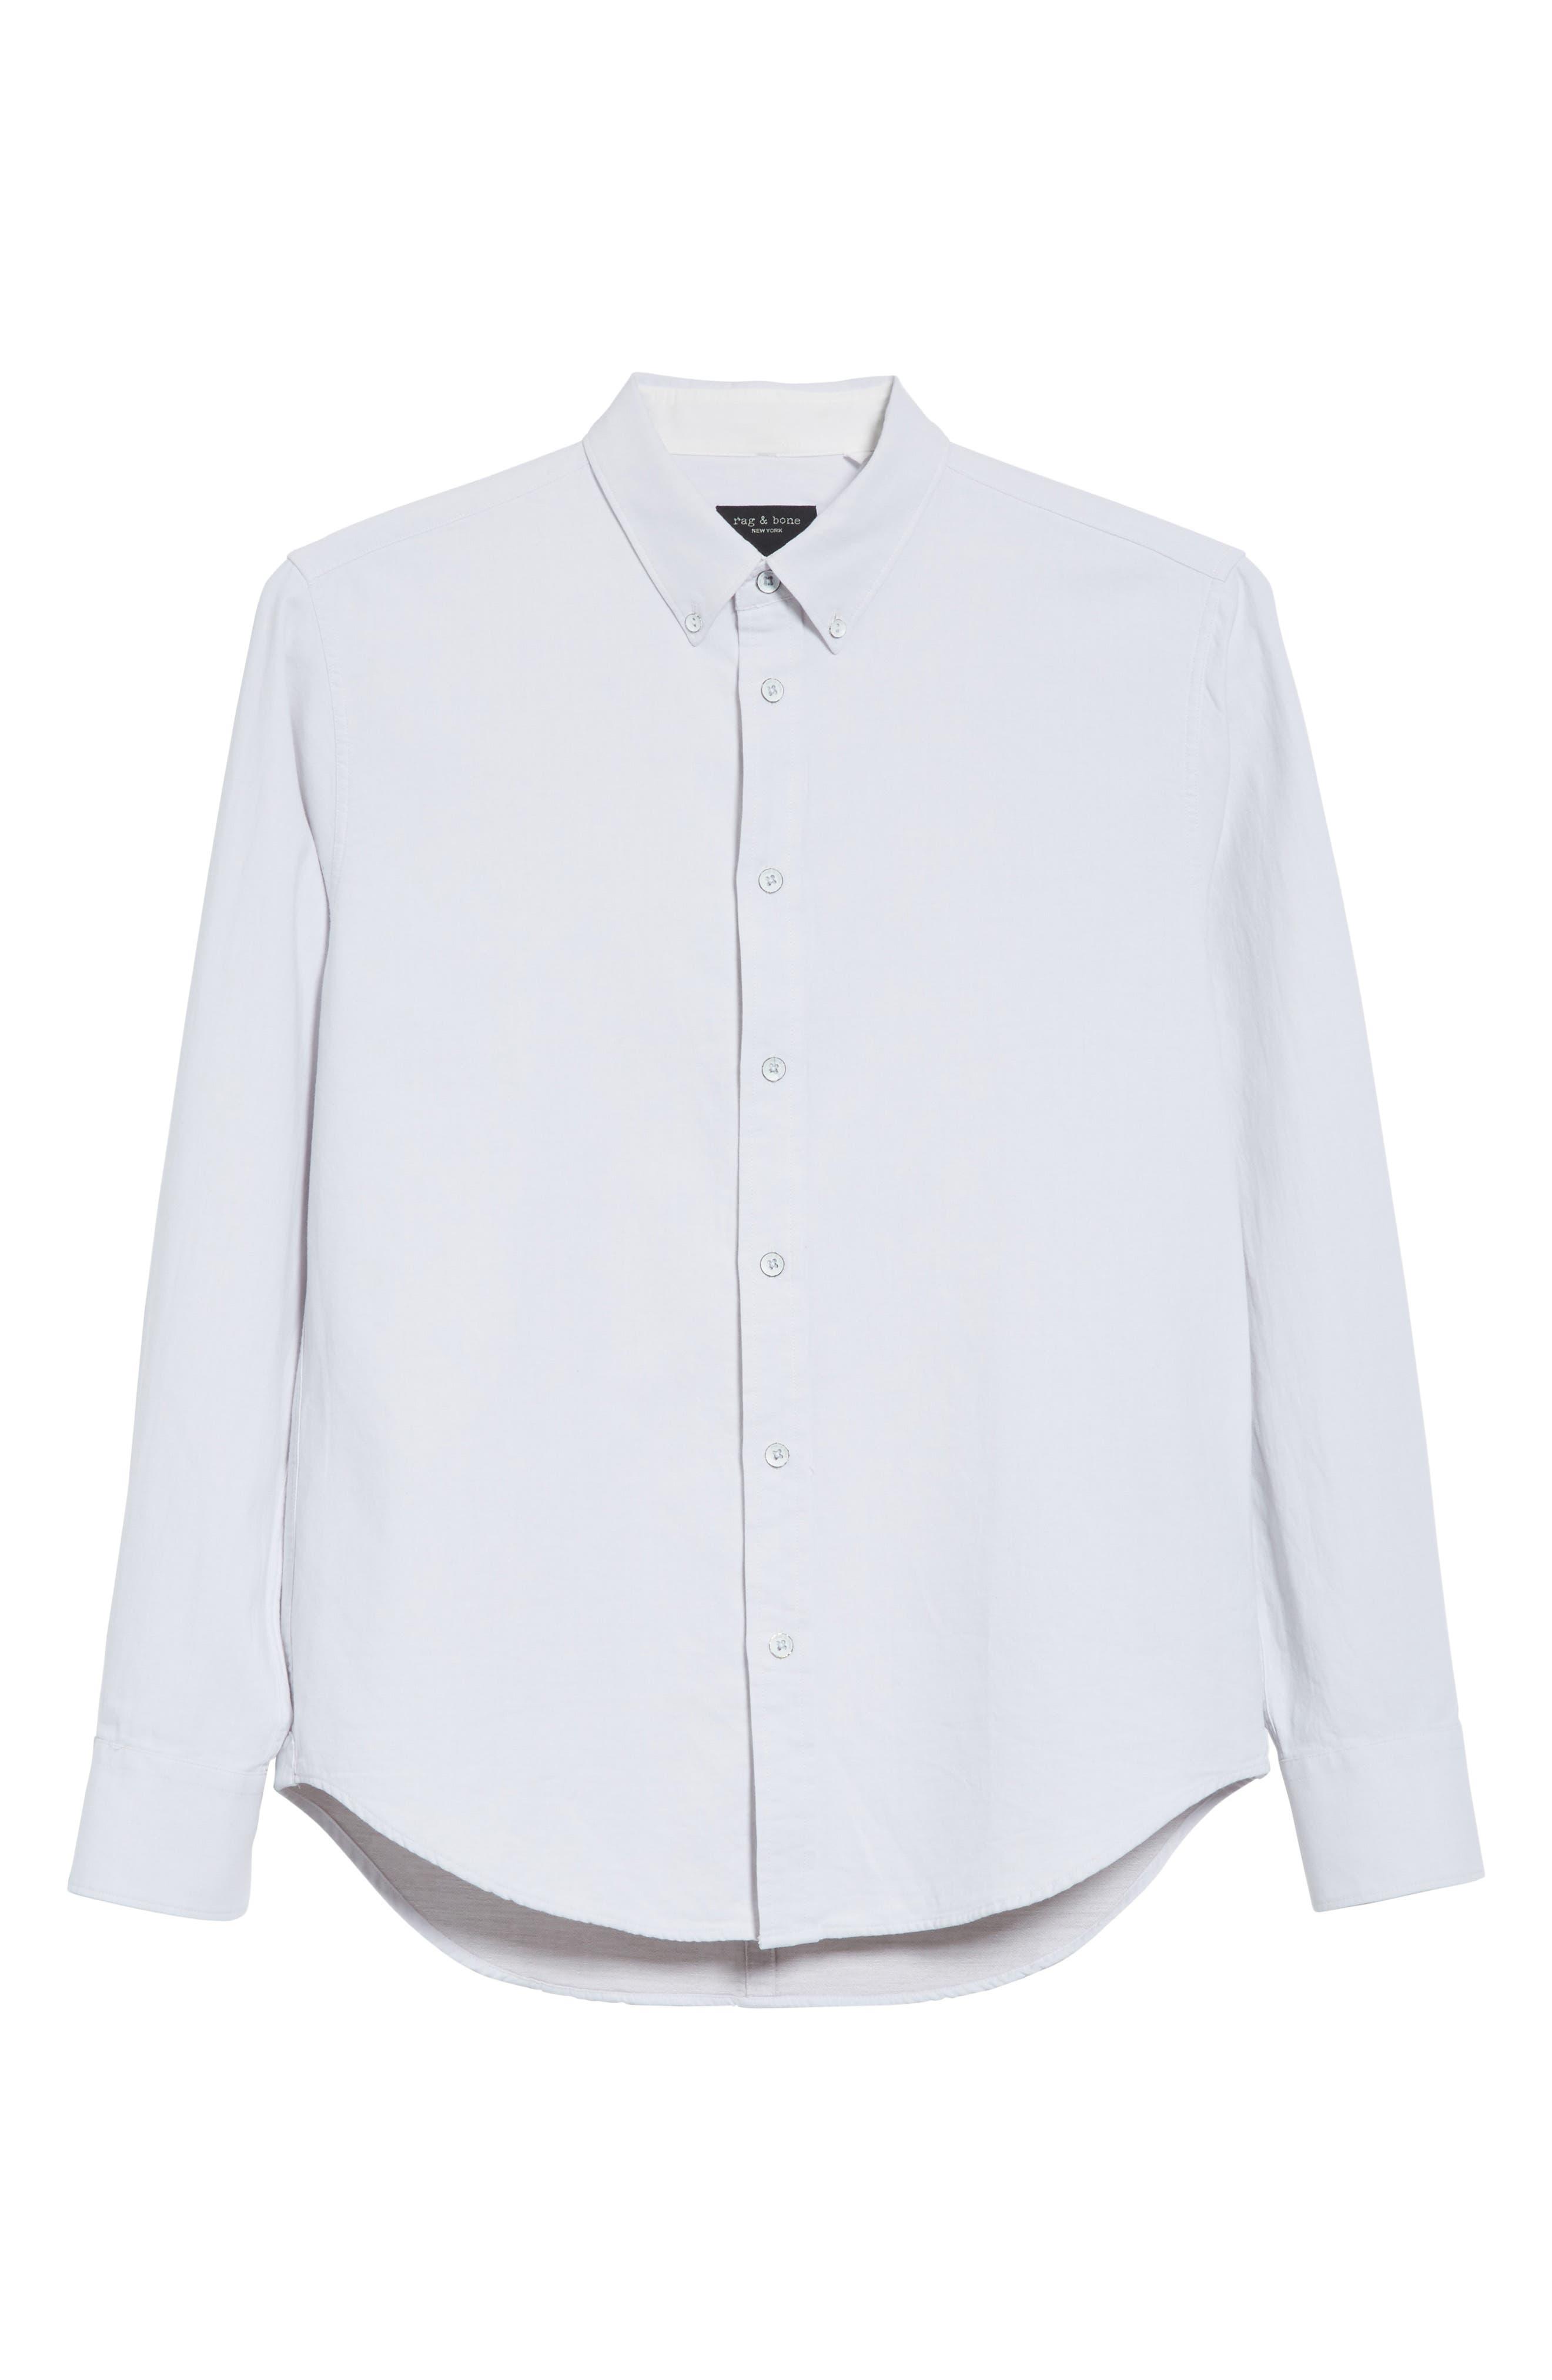 RAG & BONE,                             Tomlin Fit 2 Shirt,                             Alternate thumbnail 6, color,                             179